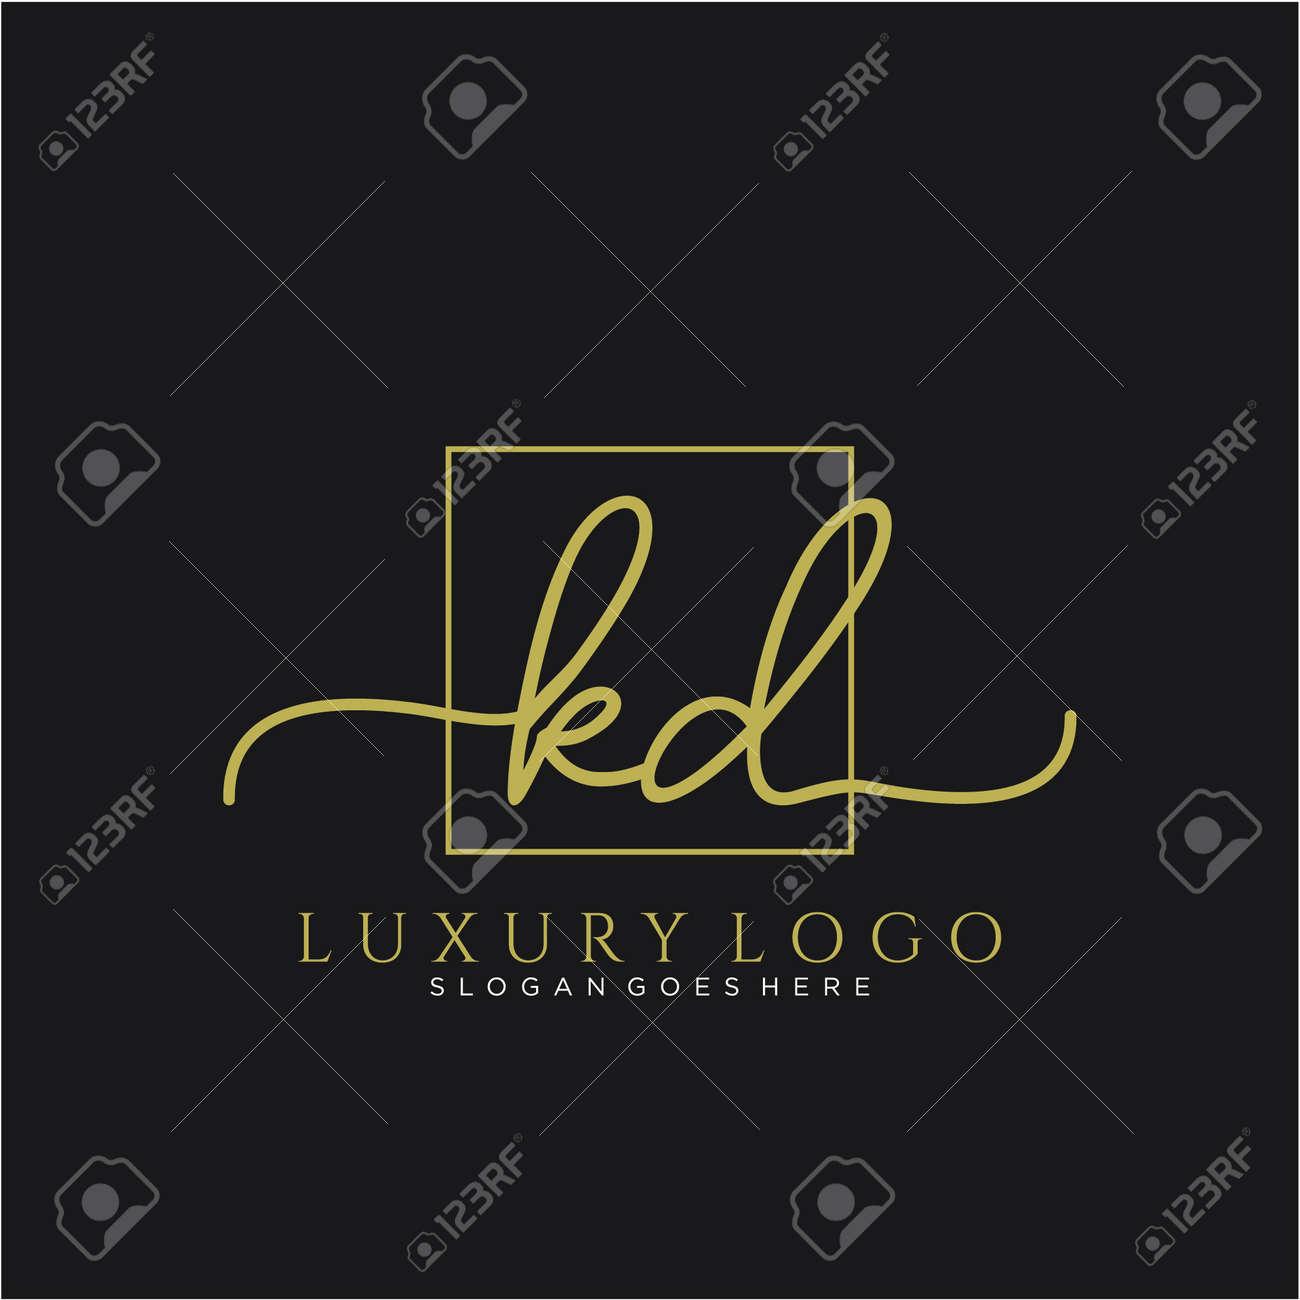 Initial handwriting logo design beautiful design handwritten logo for fashion, team, wedding, luxury logo. - 148713040